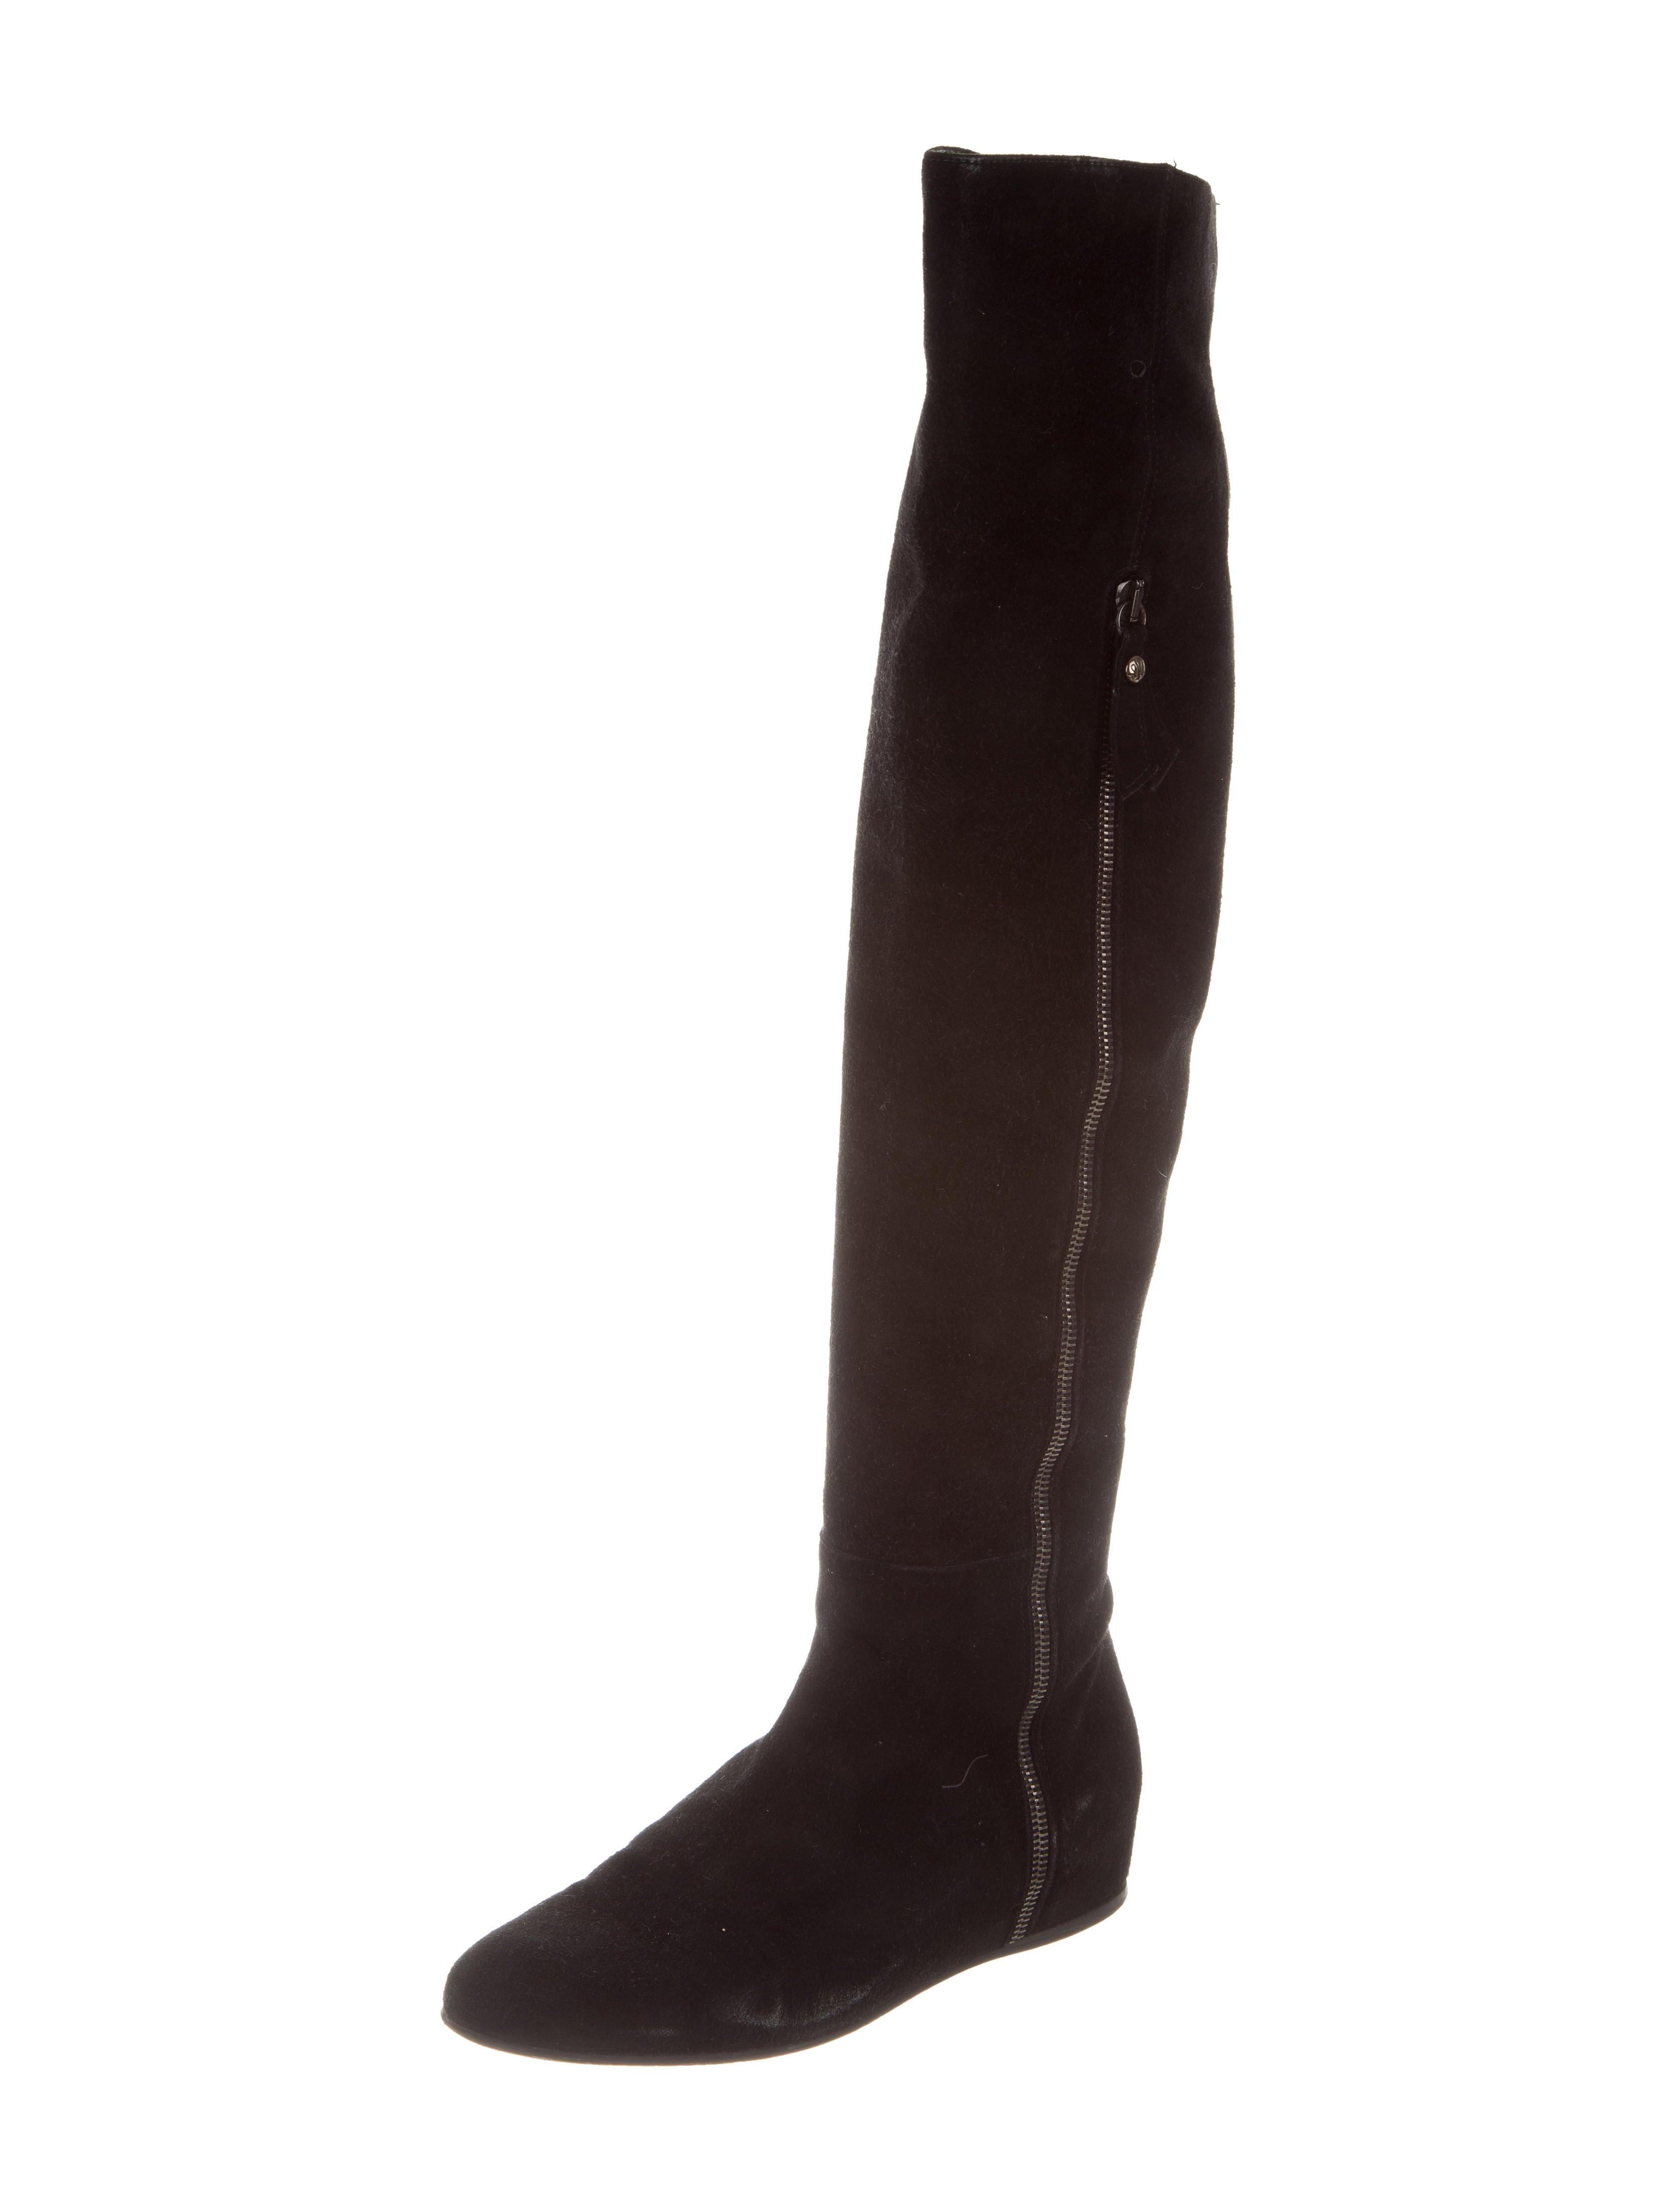 stuart weitzman suede the knee boots shoes